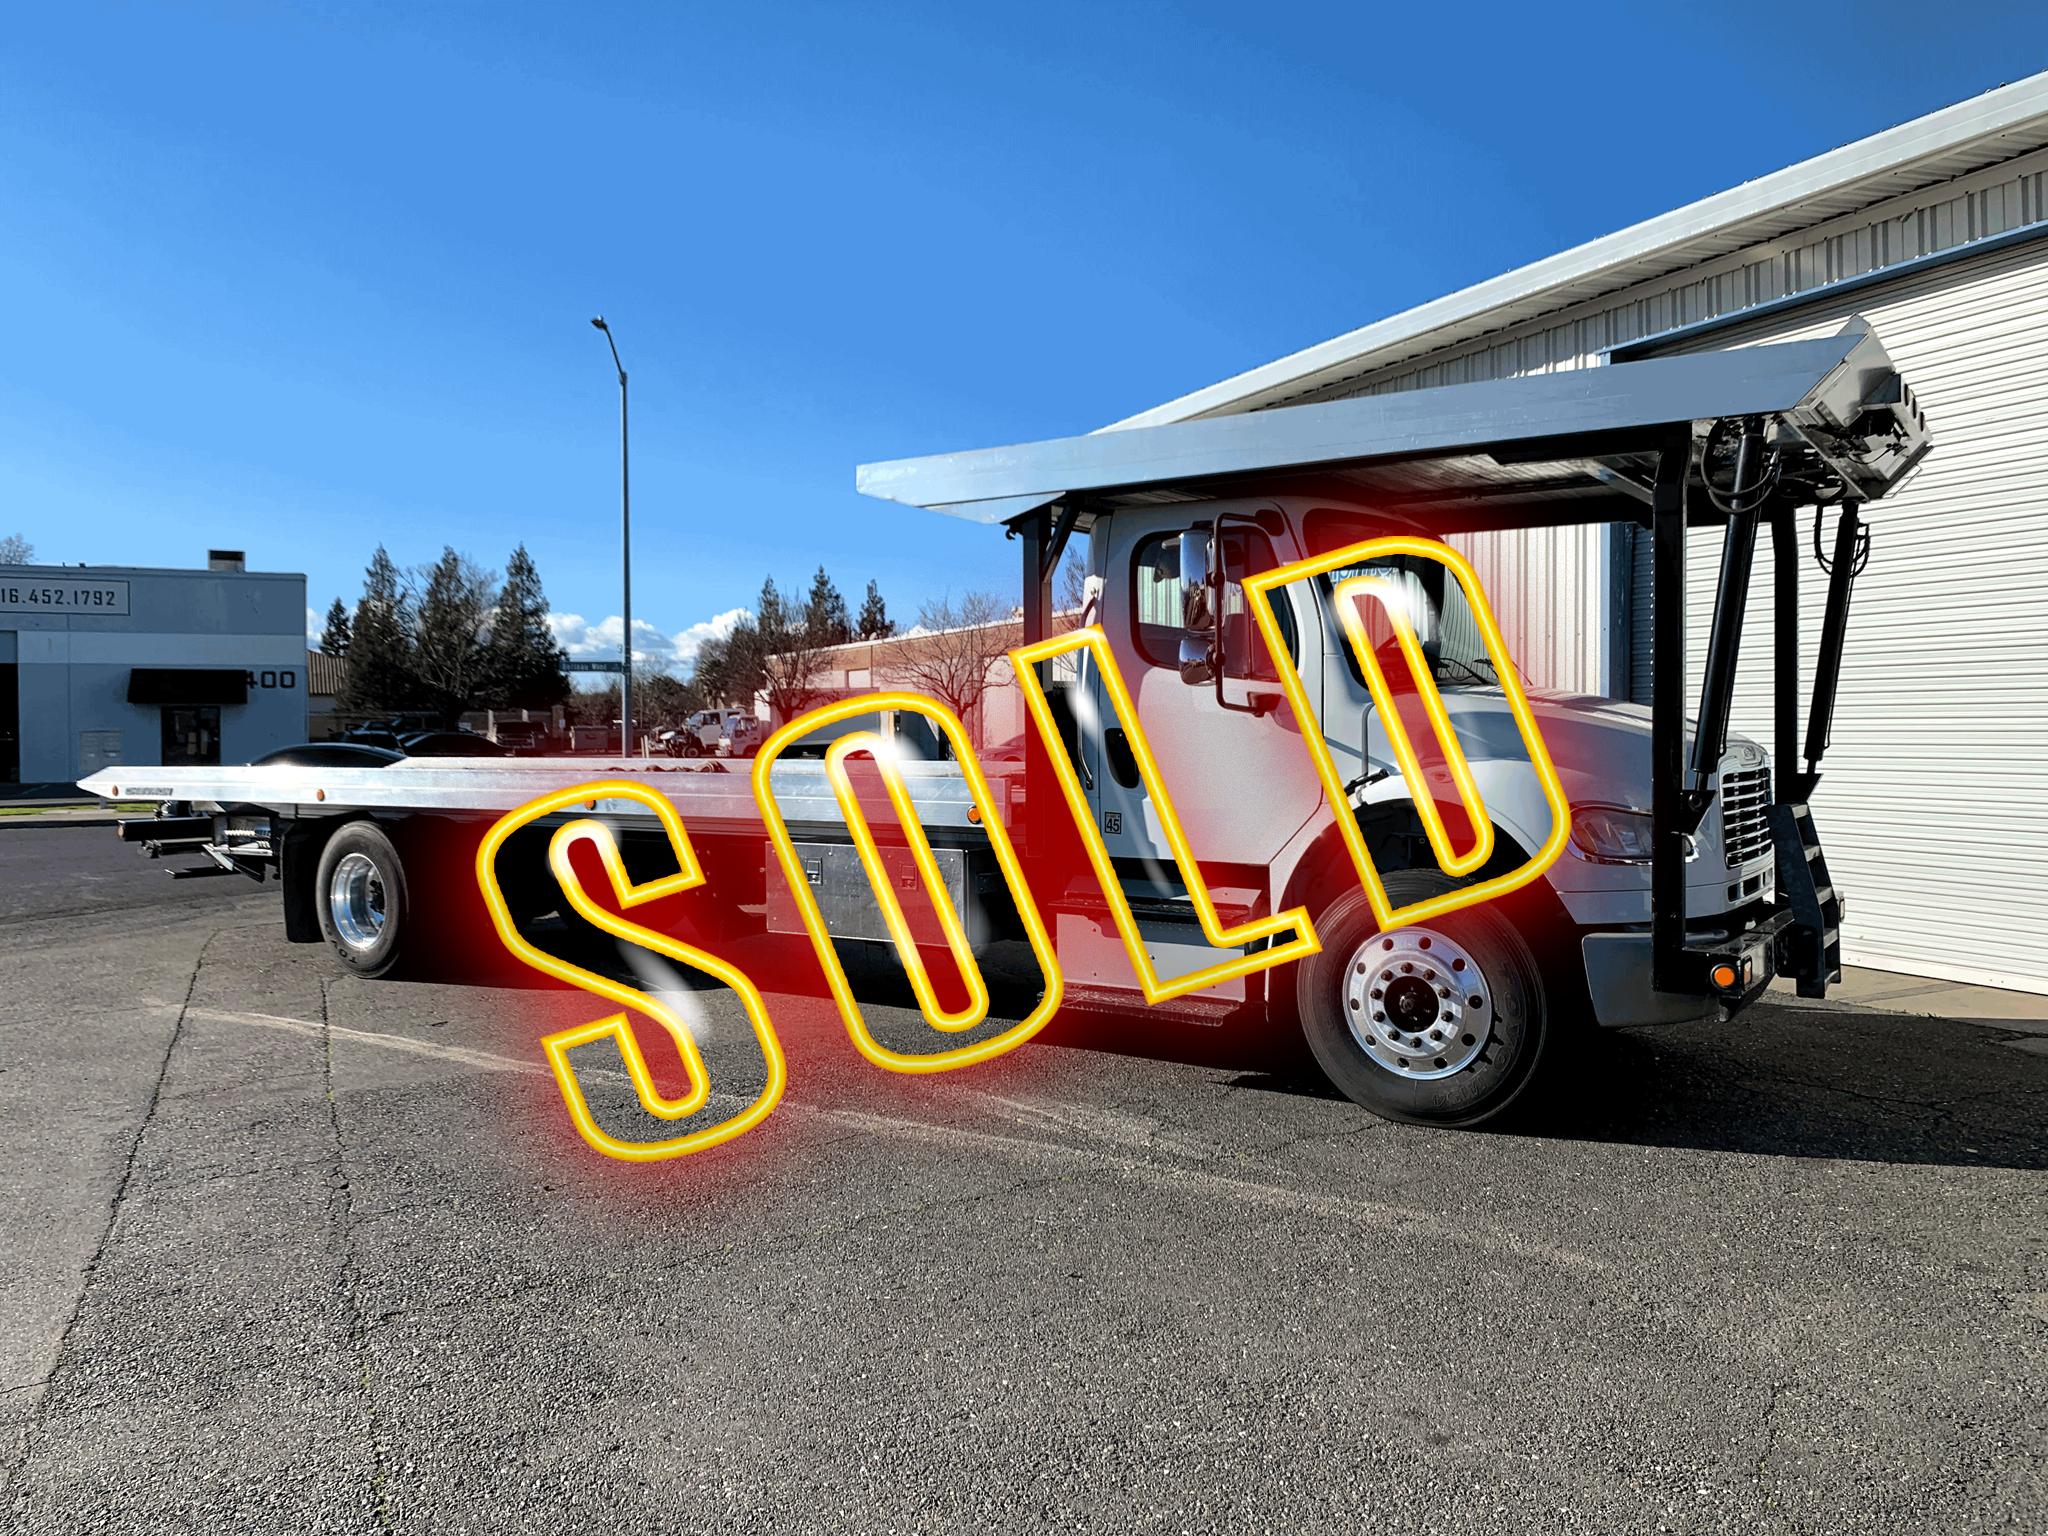 Used, 2017, Freightliner, M2 / Chevron 28.0' 4-Car, Tow Trucks